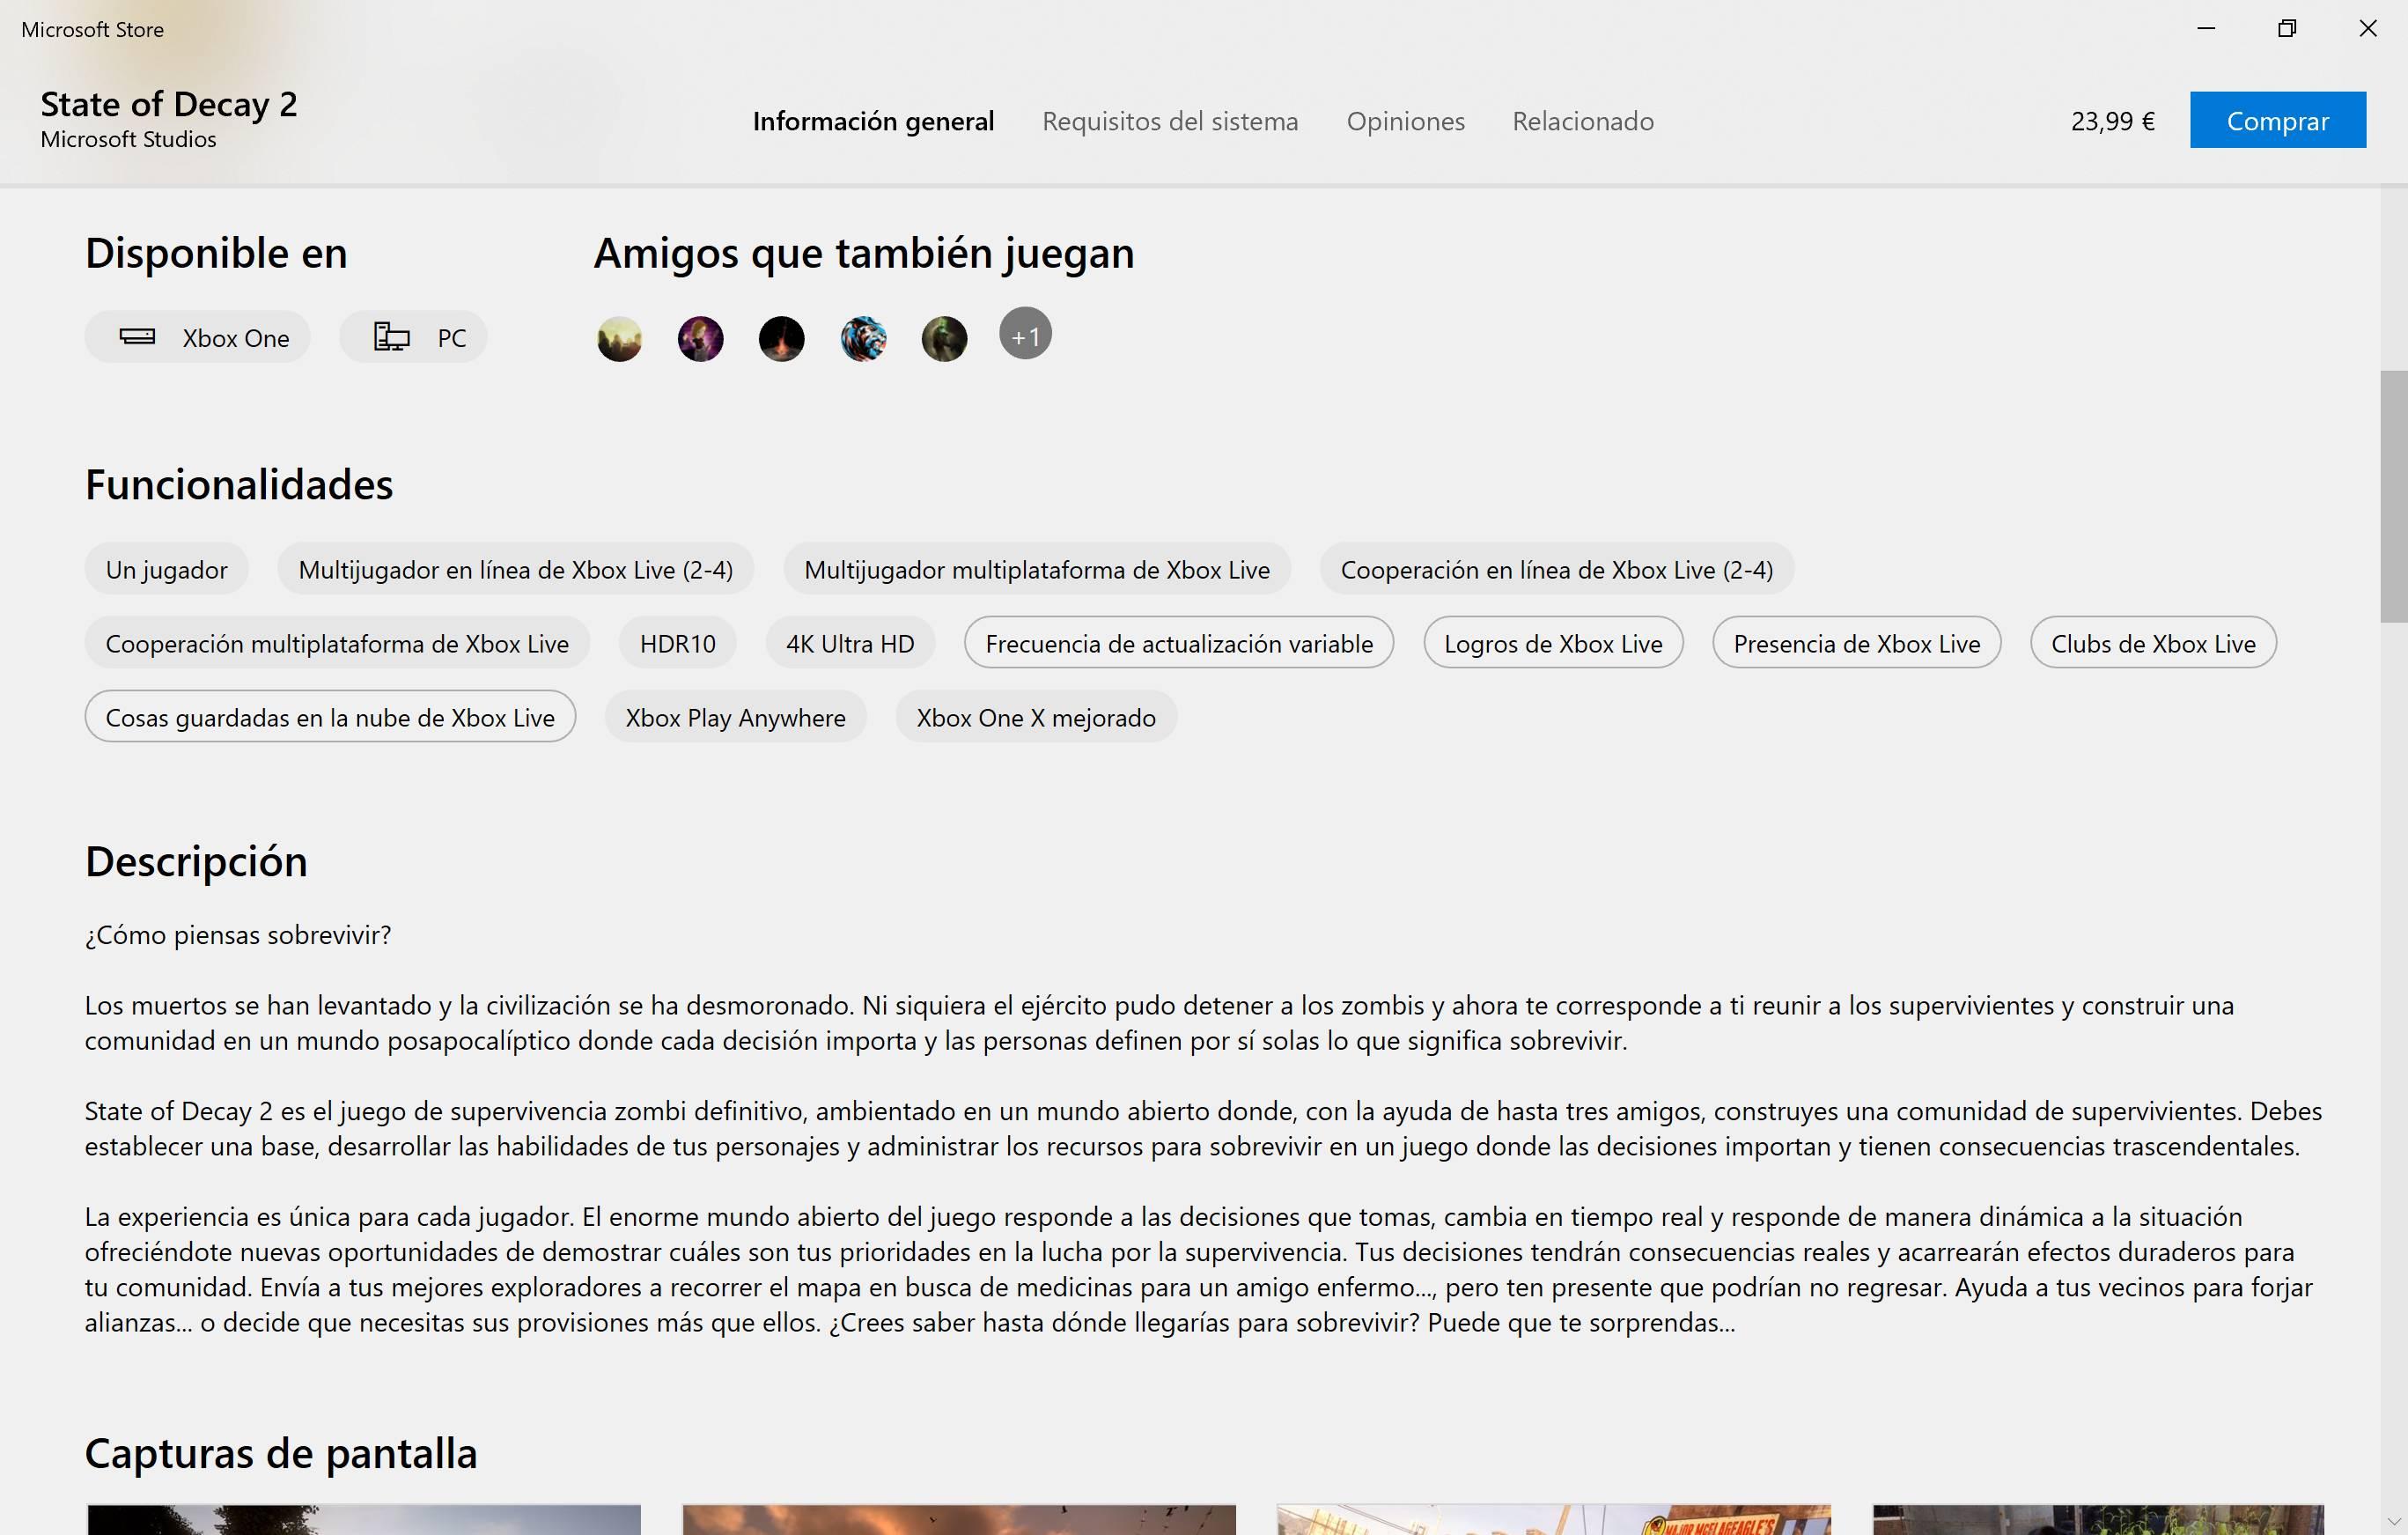 Microsoft Store detalles de un juego